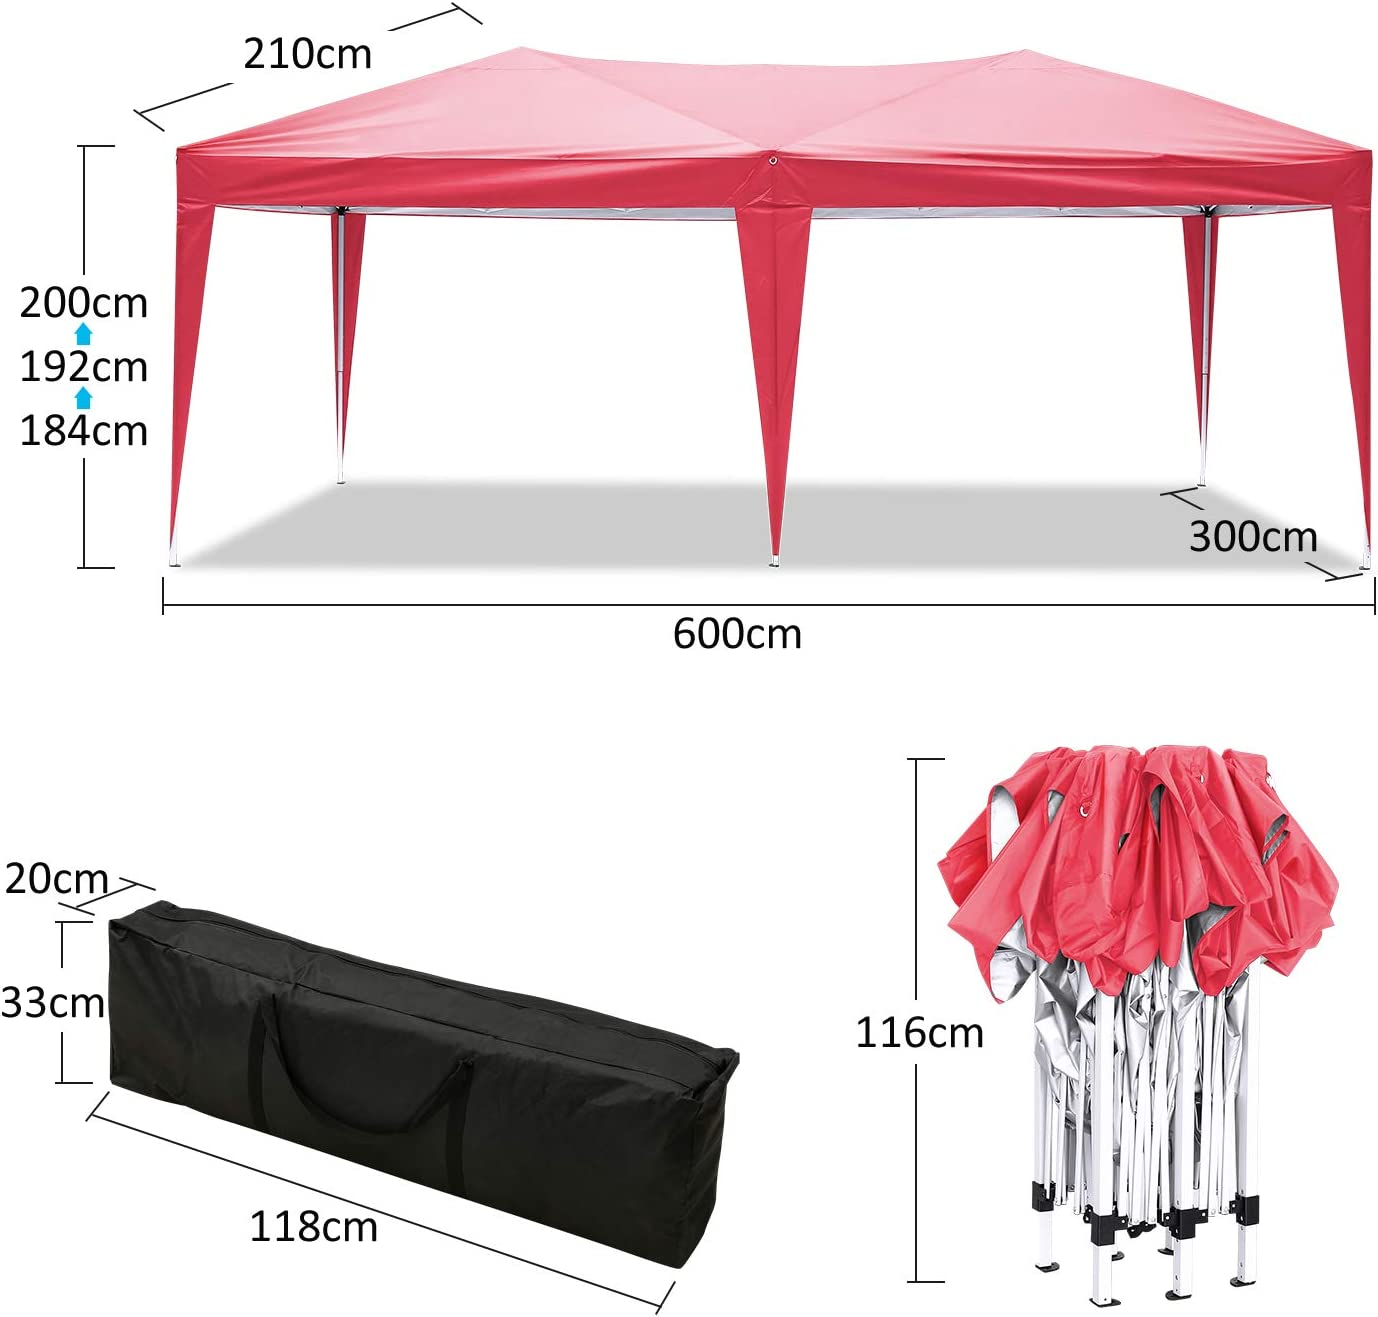 Garden Gazebo Waterproof Marquee Canopy Round Outdoor Patio Party Tent Sunshade